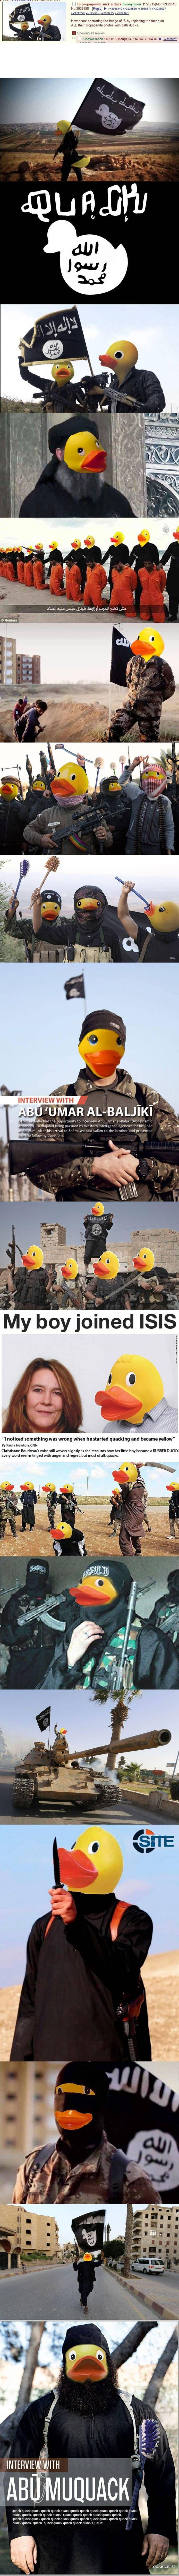 4chan Photoshops terrorists into rubber ducks